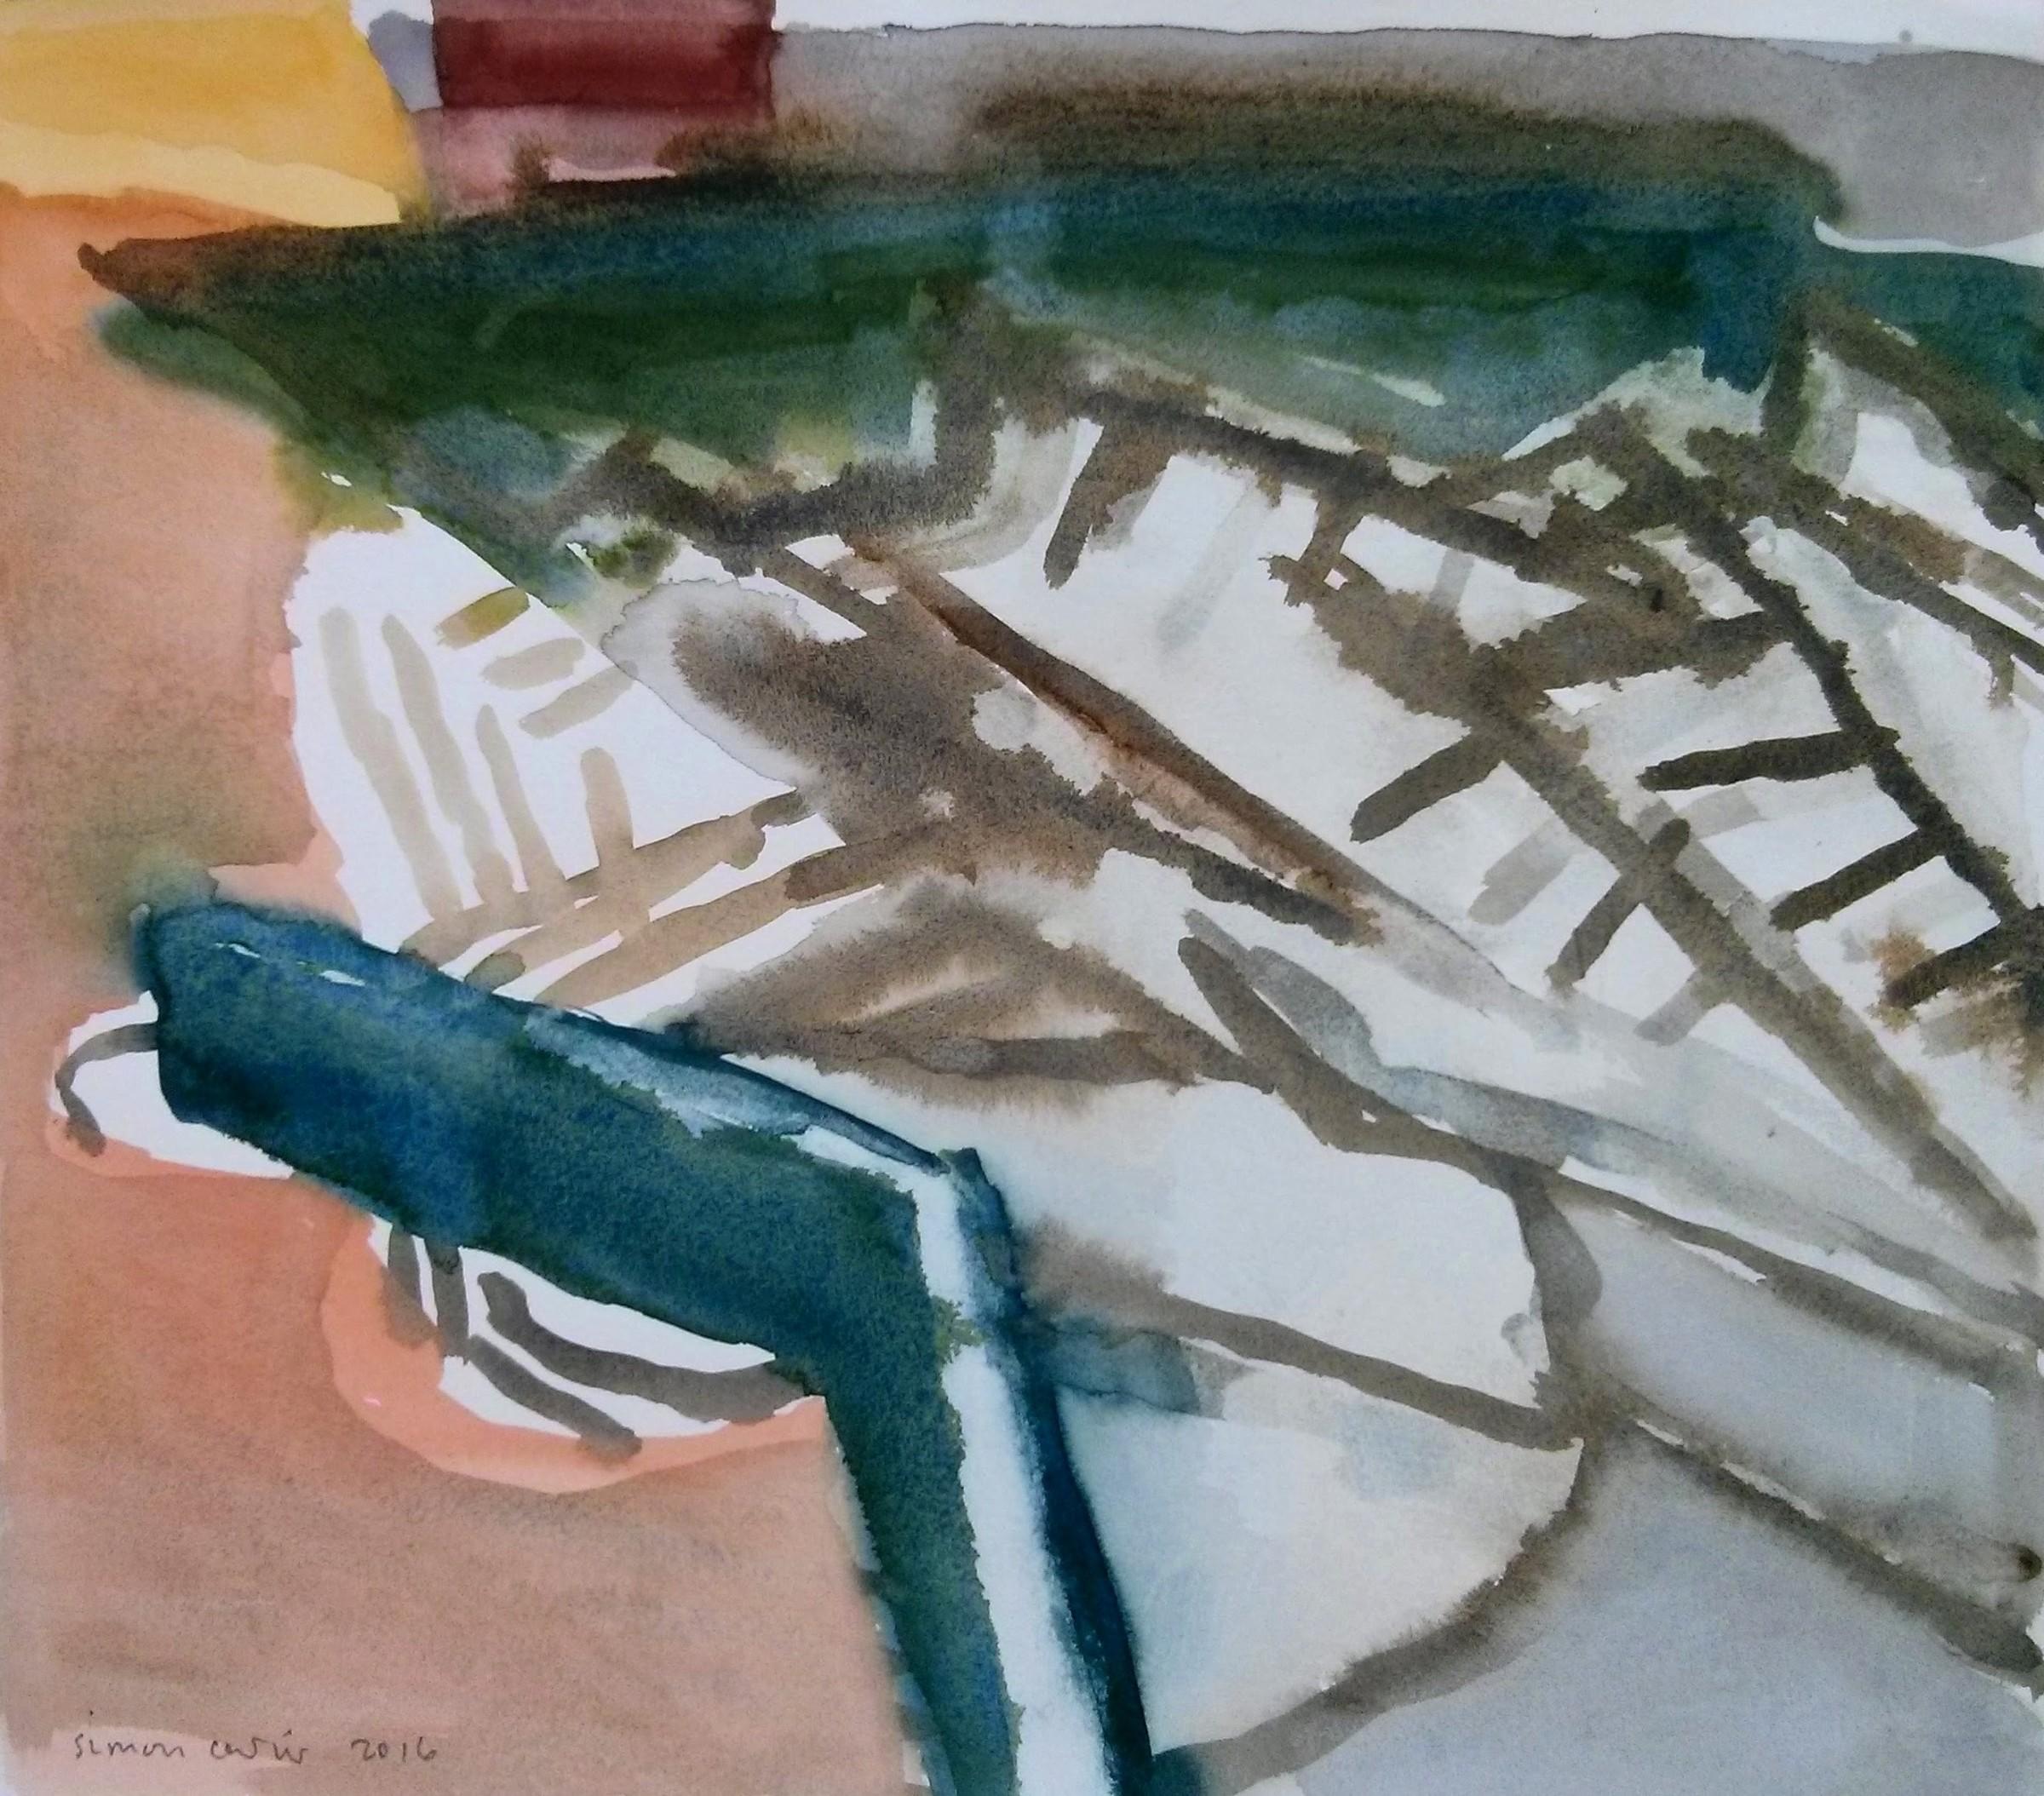 <span class=&#34;link fancybox-details-link&#34;><a href=&#34;/exhibitions/16/works/image_standalone402/&#34;>View Detail Page</a></span><p>Simon Carter,&#160;<em>Winter Sea</em>, &#163;1450</p>